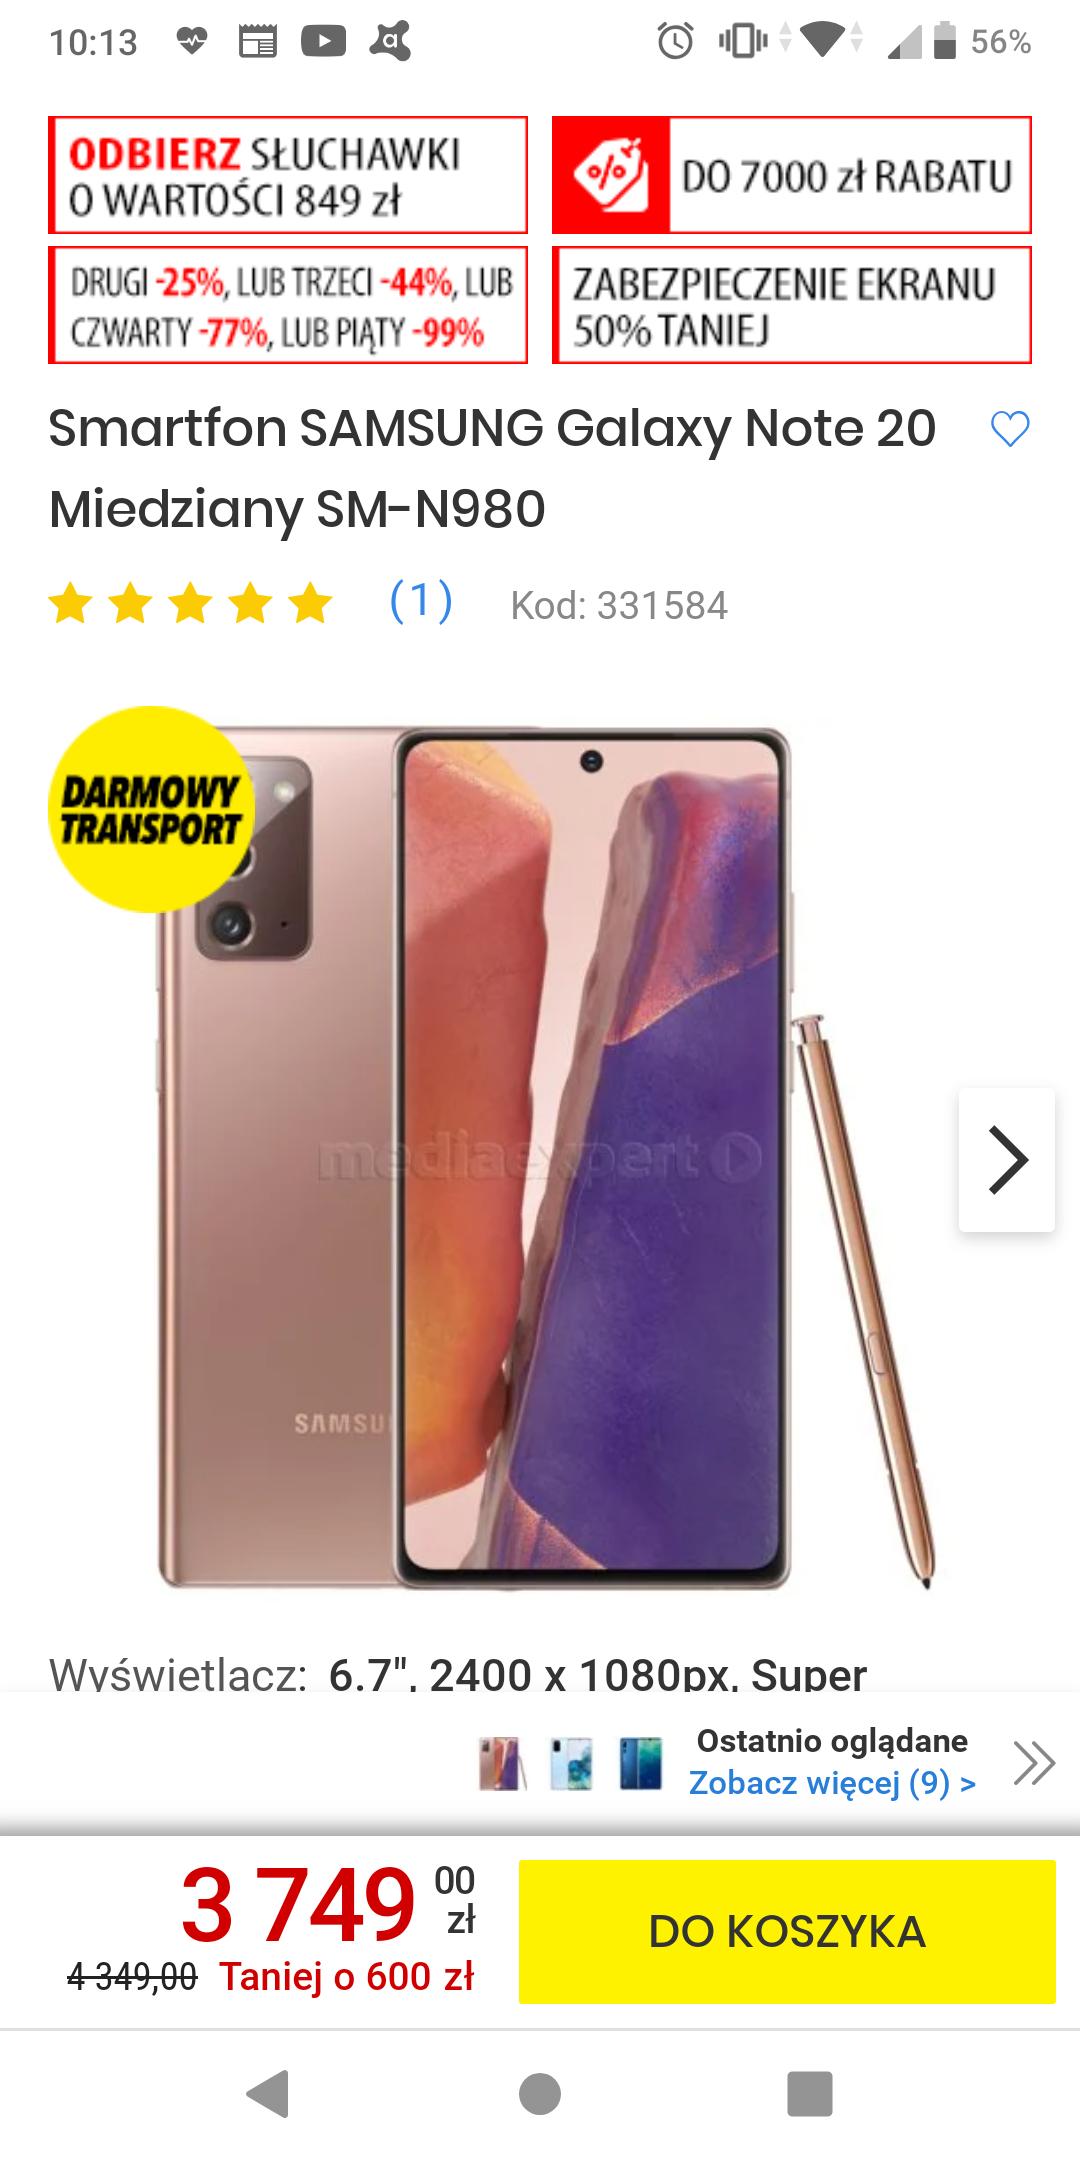 Smartfon SAMSUNG Galaxy Note 20 8+256 Miedziany SM-N980